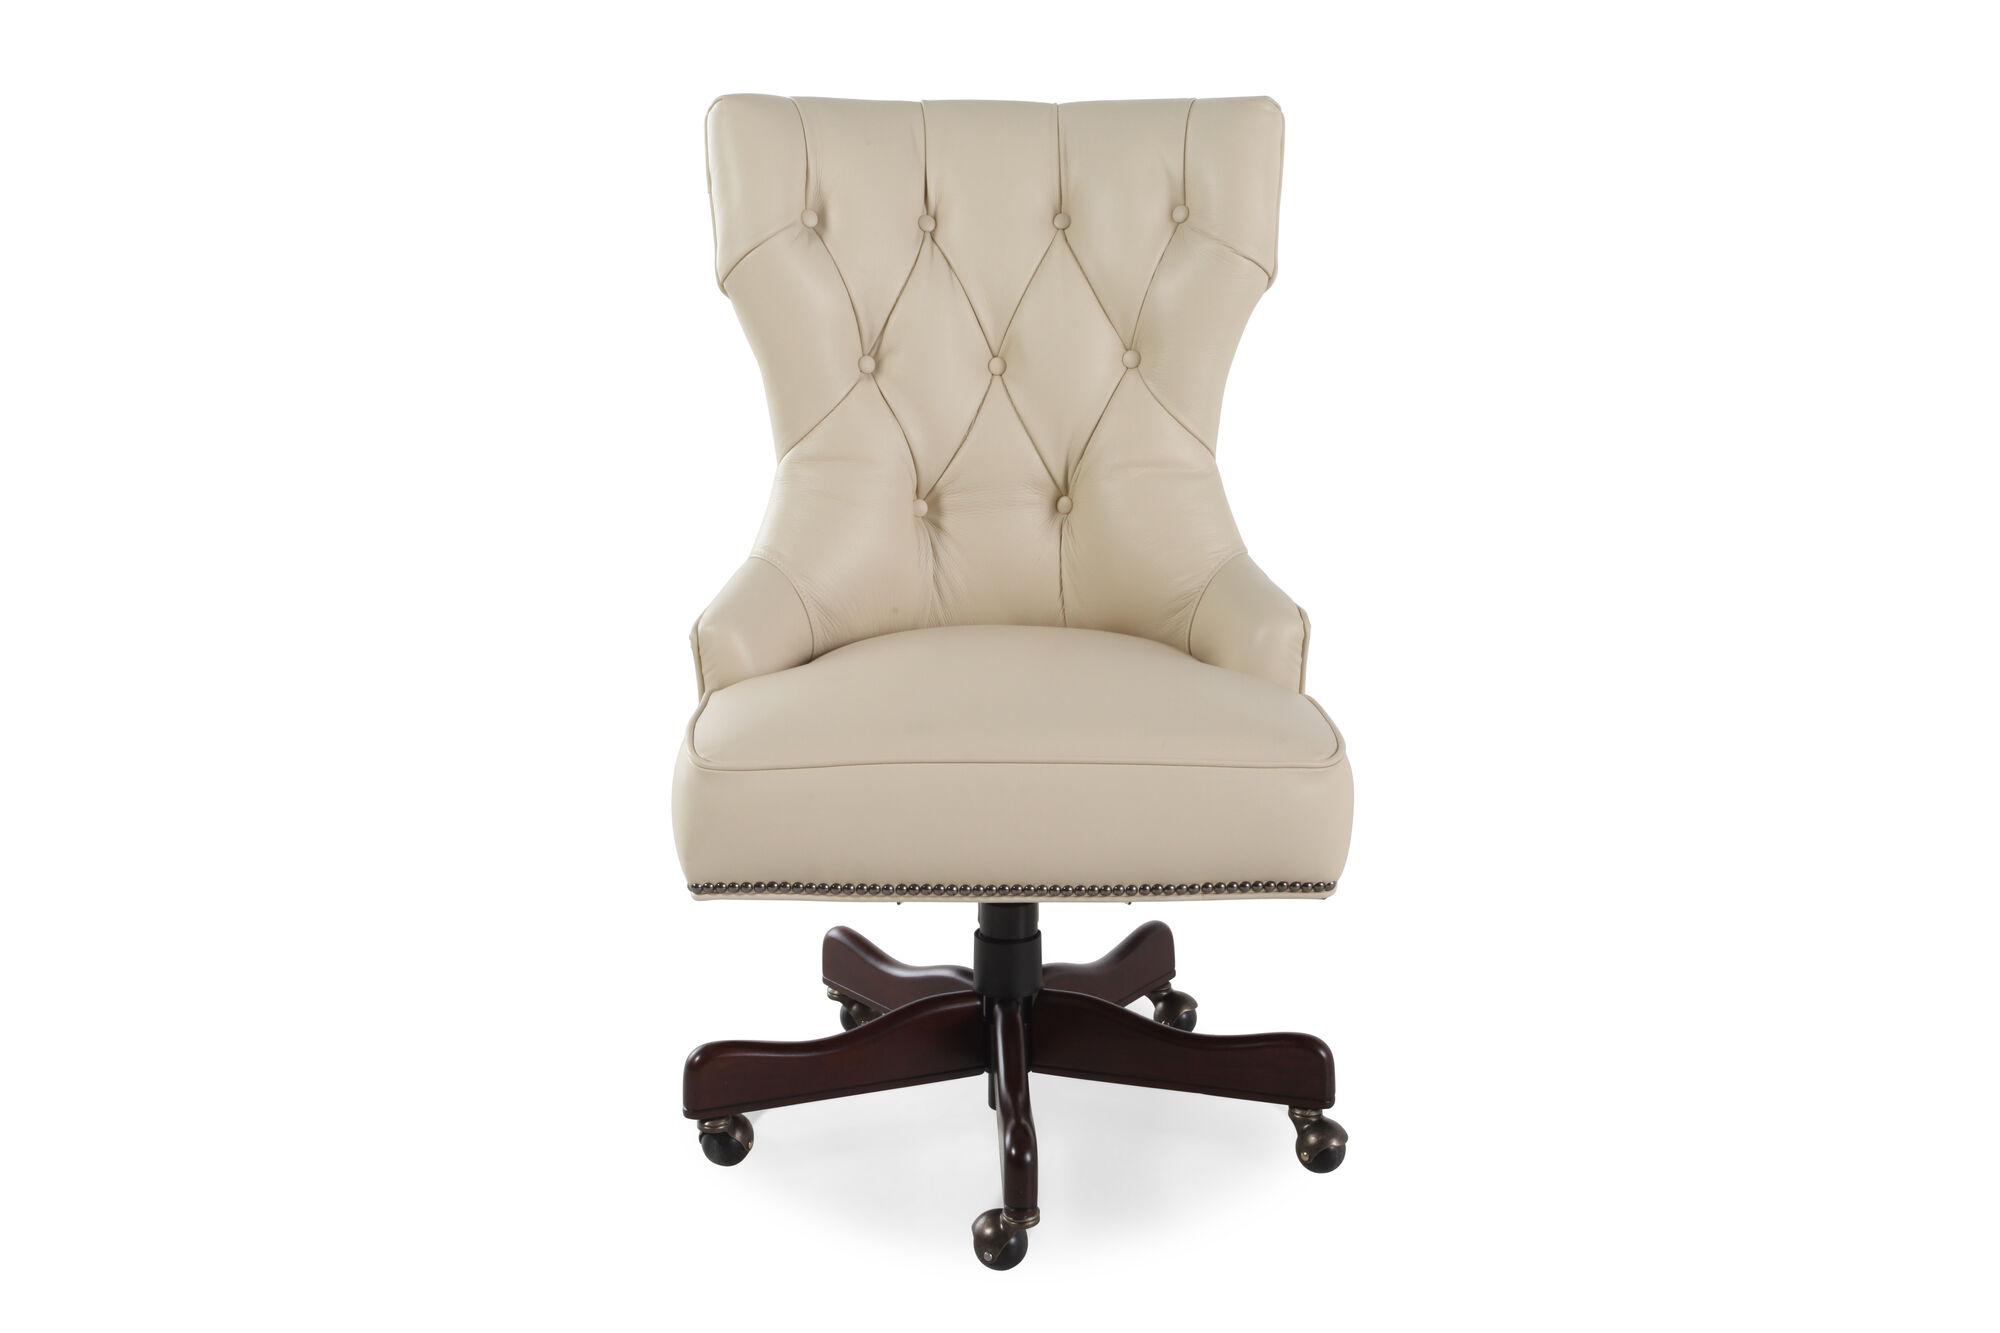 leather button tufted swivel tilt desk chair in ivory. Black Bedroom Furniture Sets. Home Design Ideas